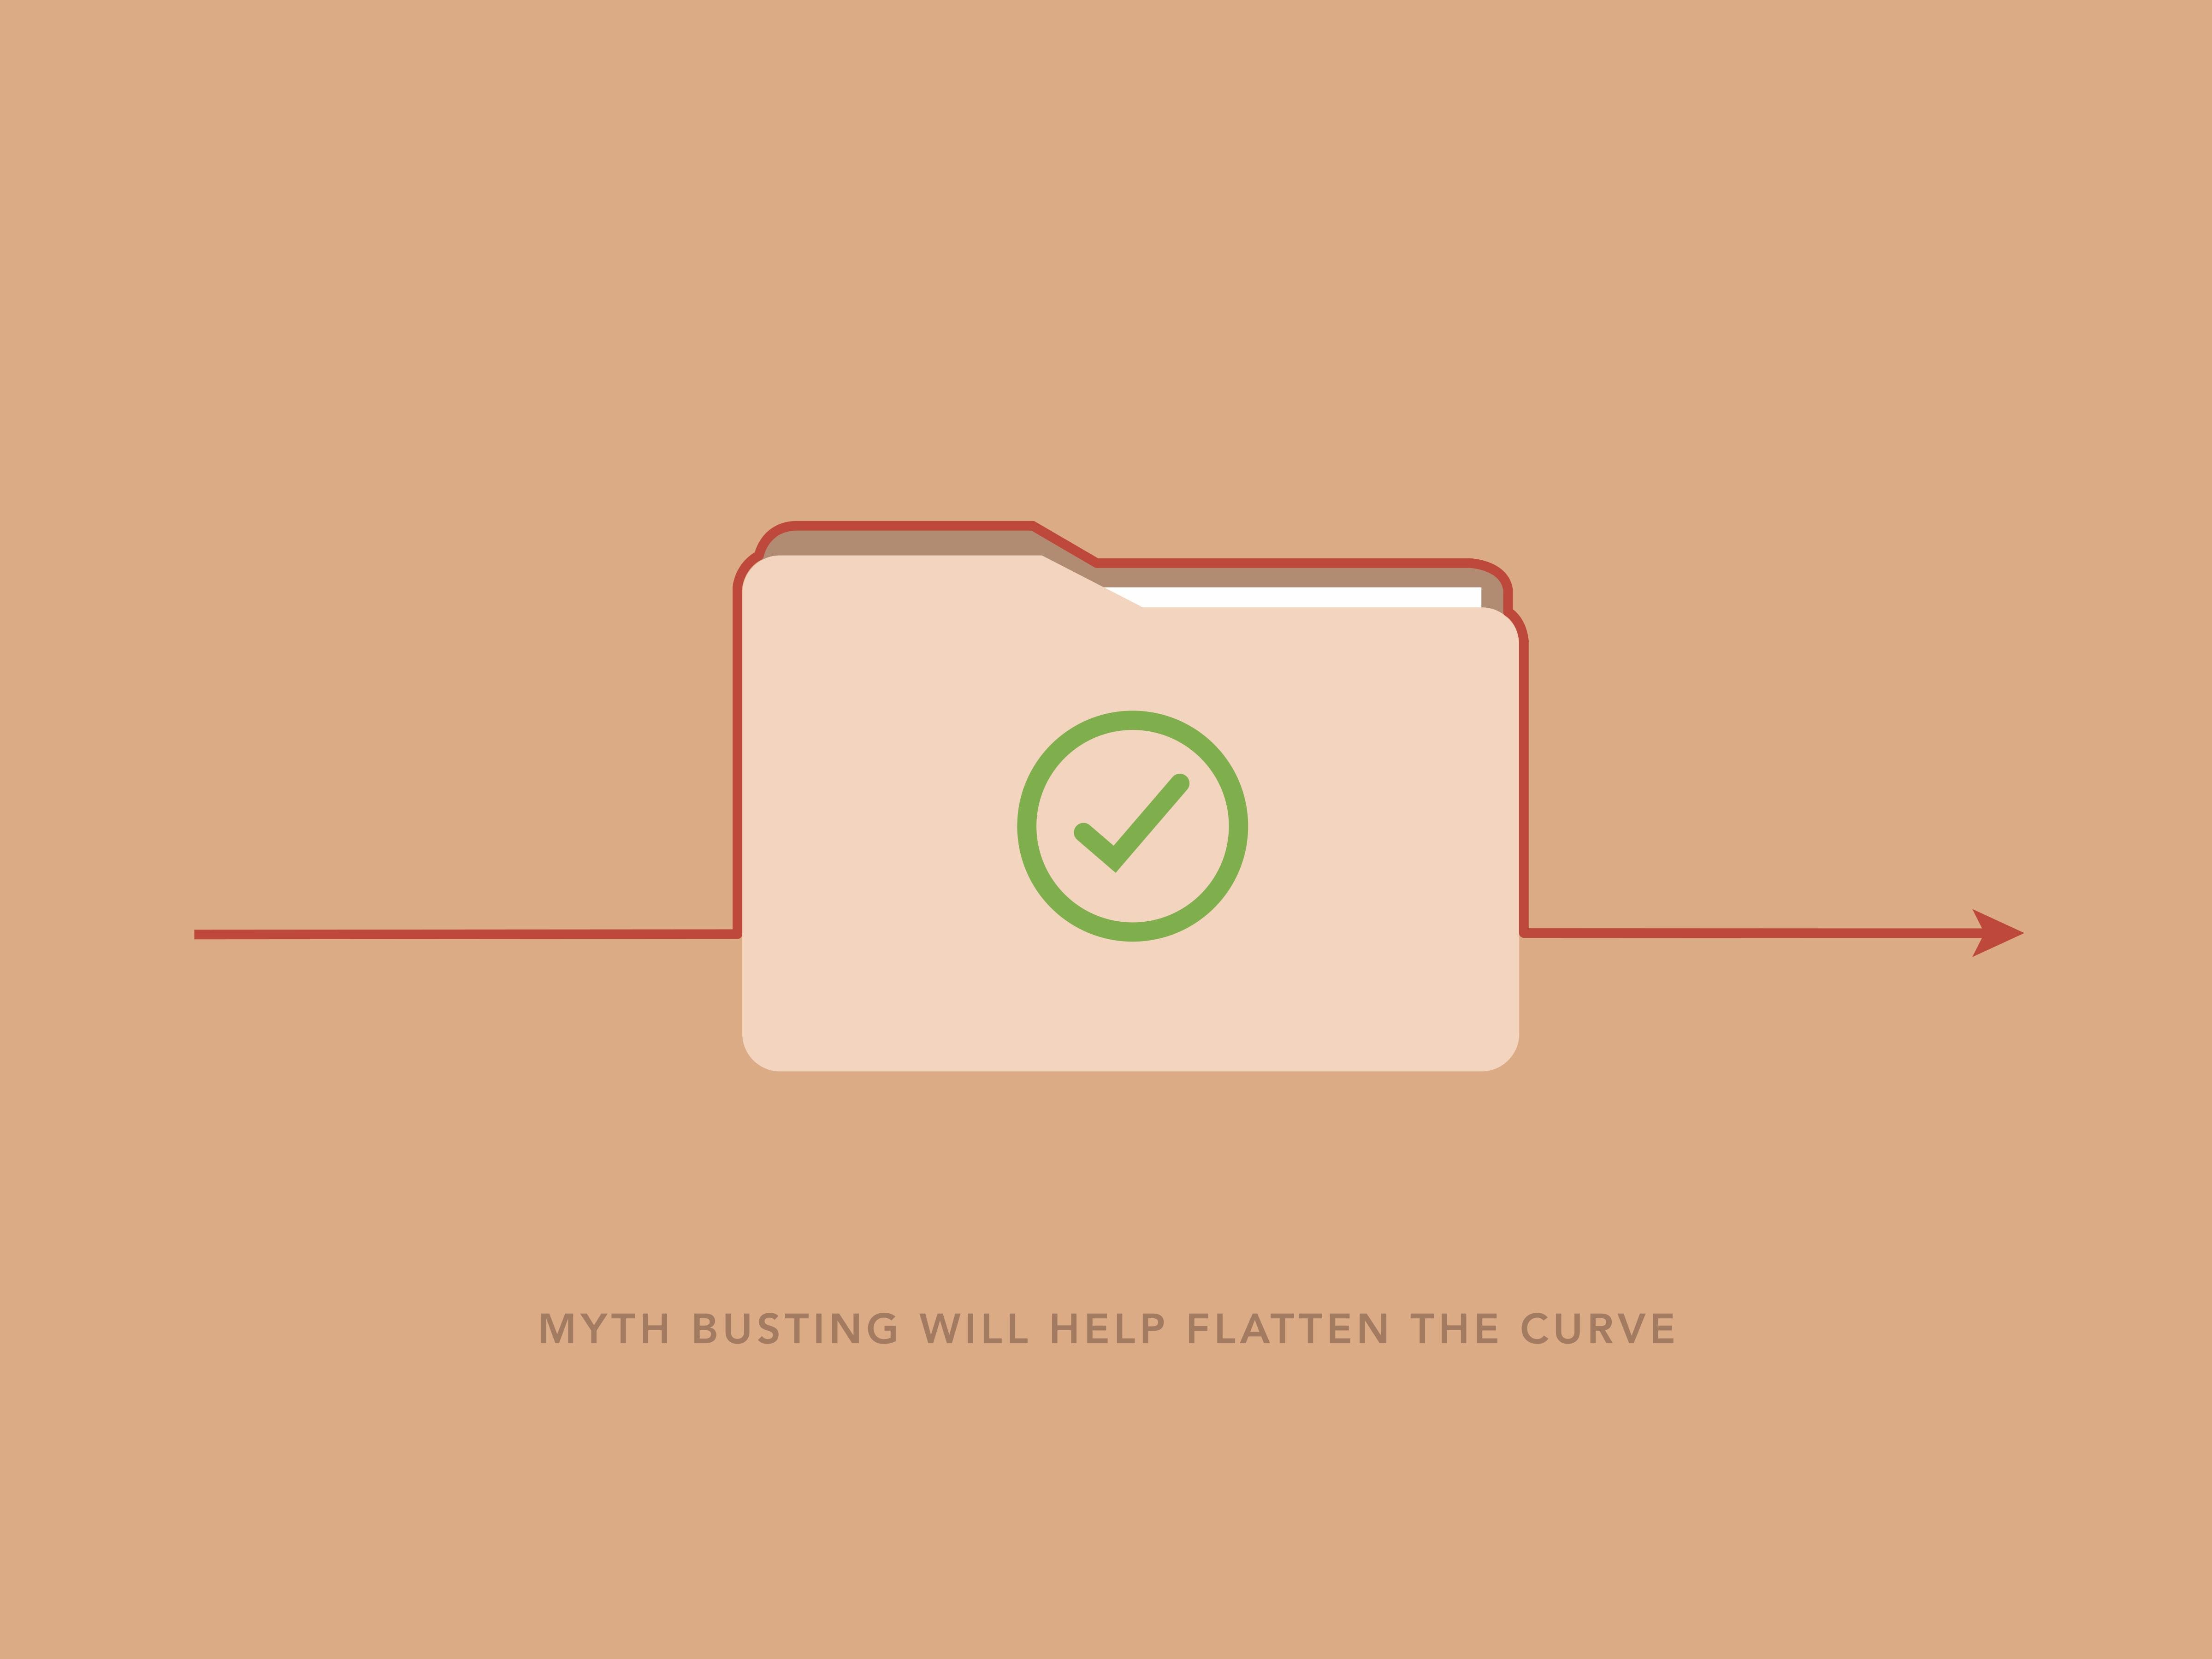 Myth busting will help flatten the curve / L'élimination des mythes aidera à aplatir la courbe